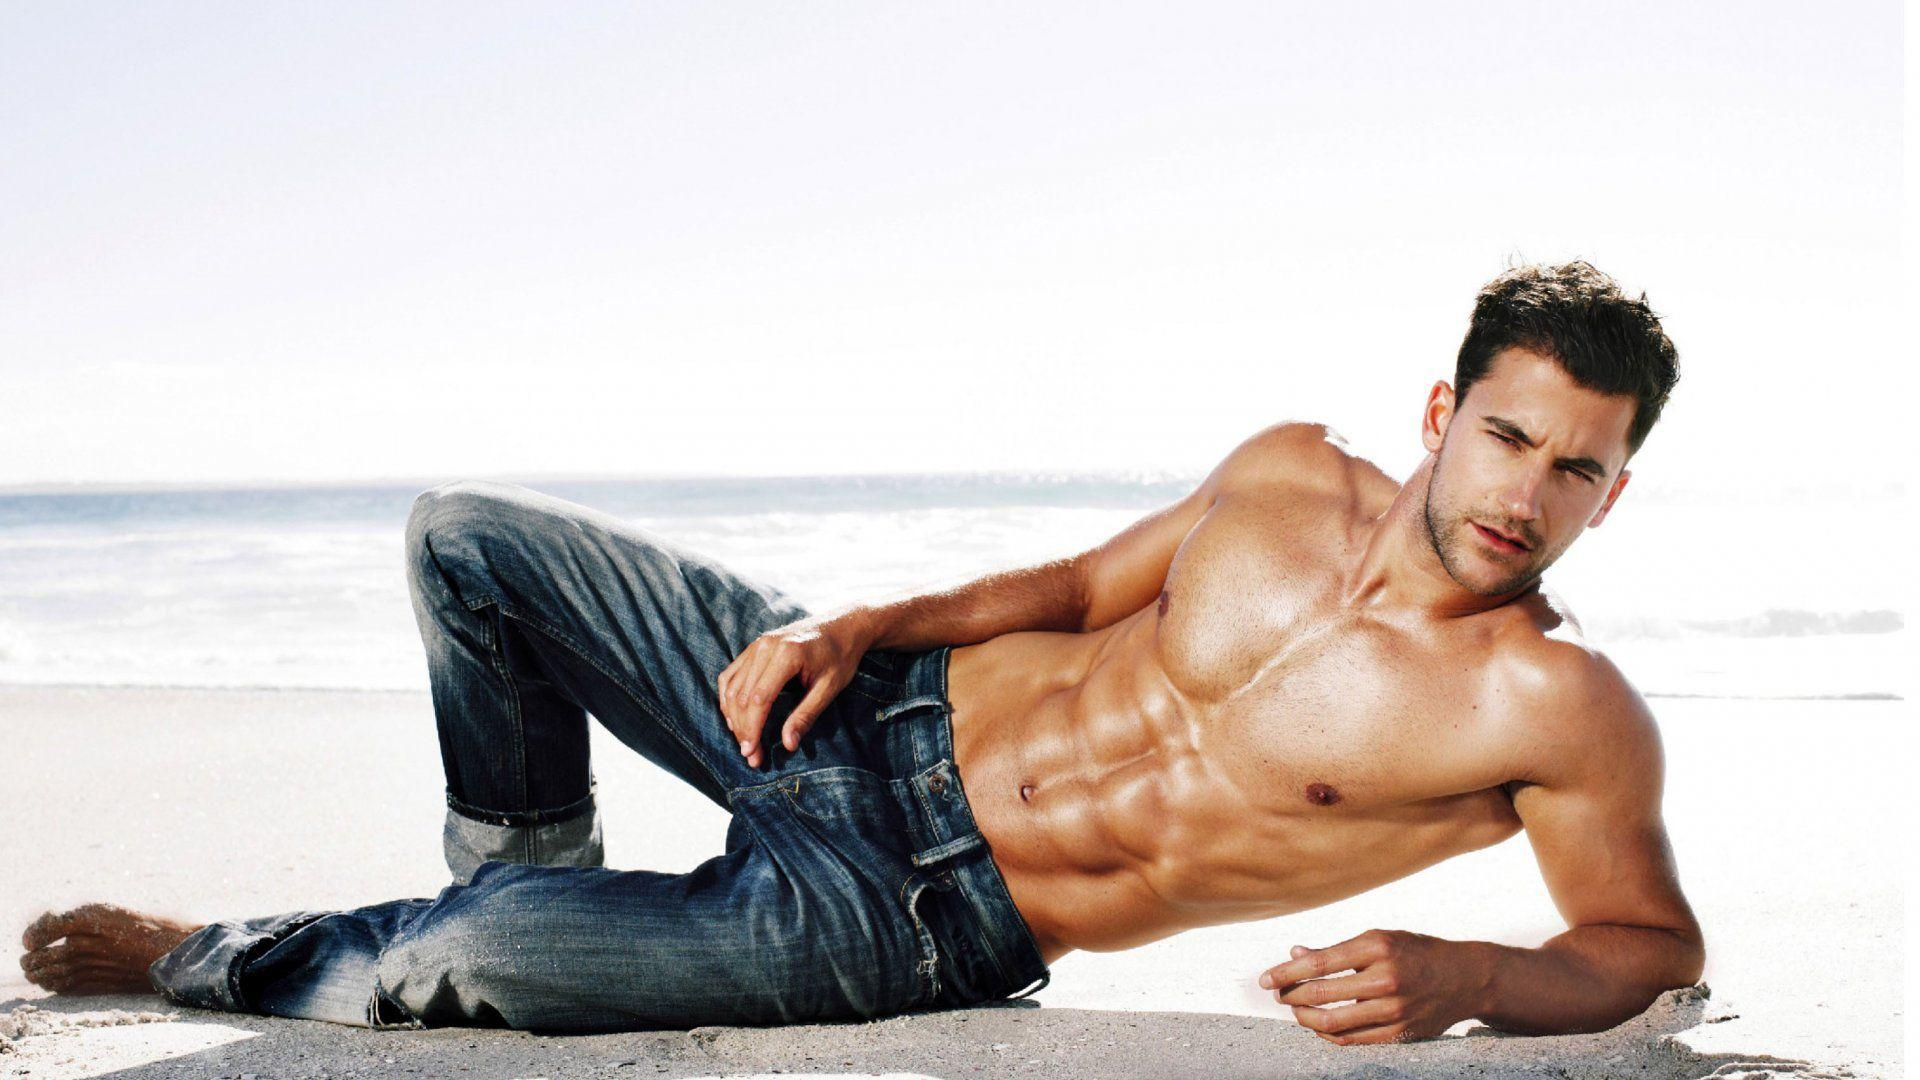 Gay models wallpaper